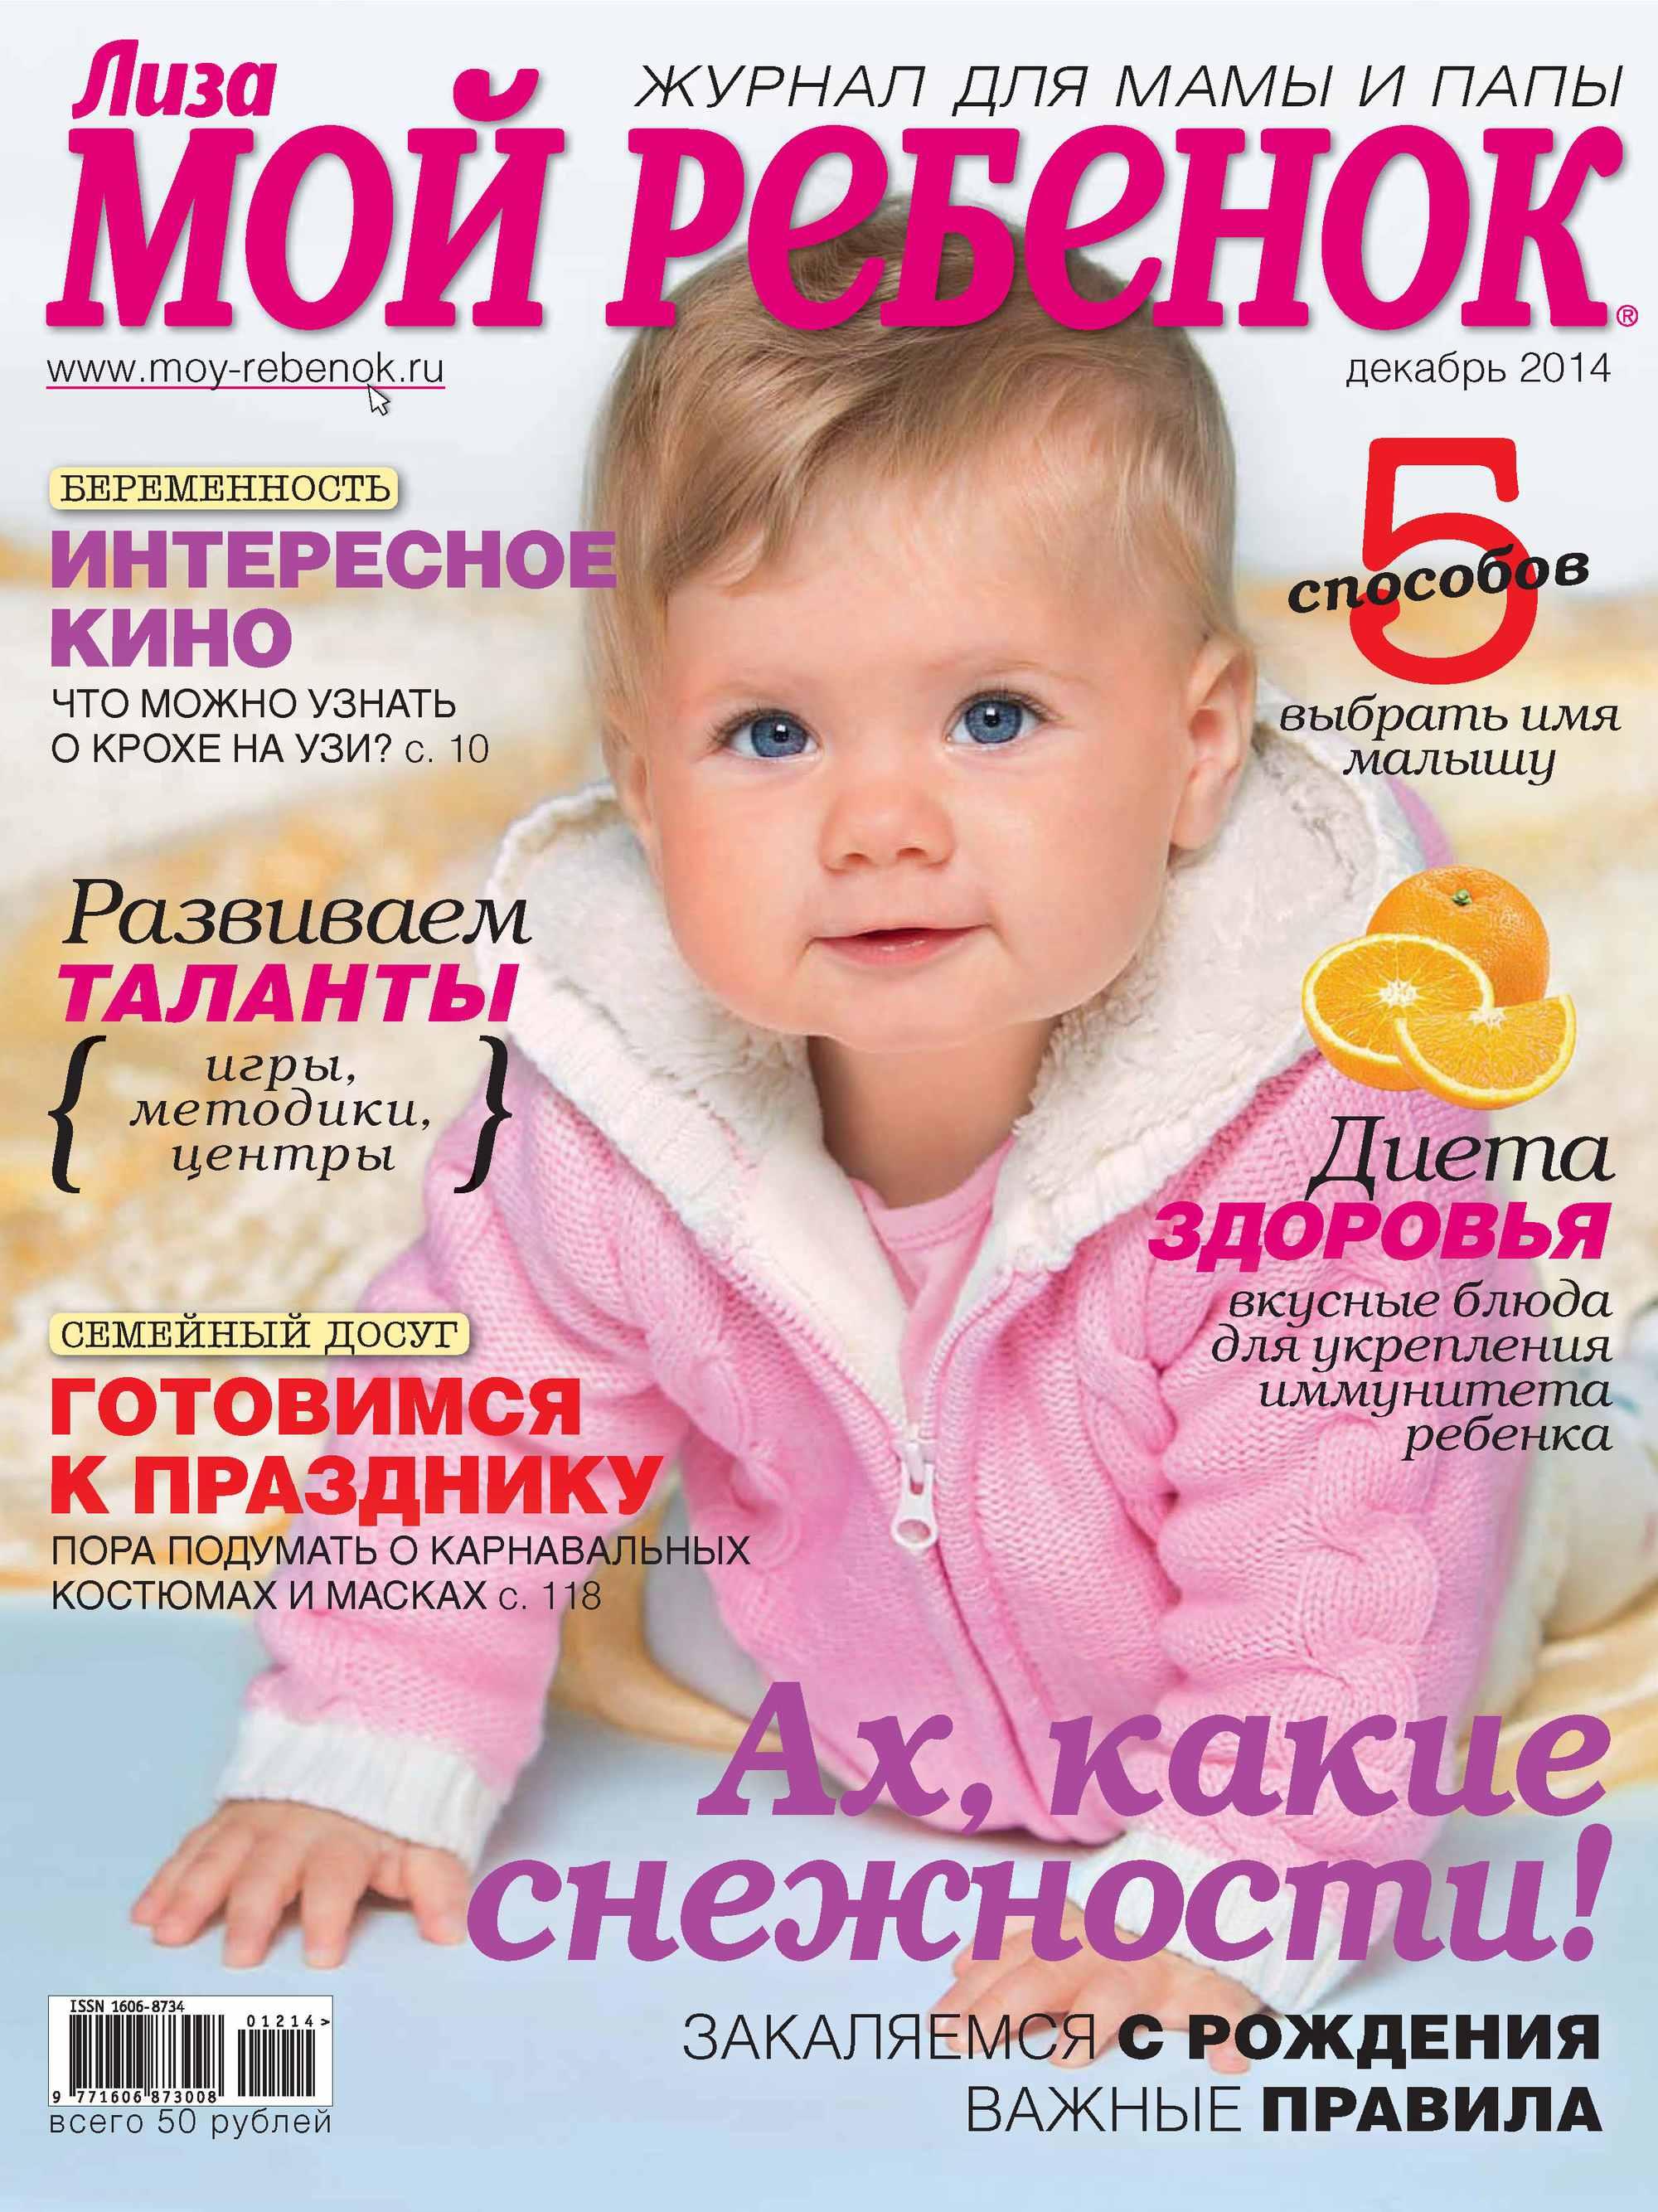 Журнал «Лиза. Мой ребенок» №12/2014